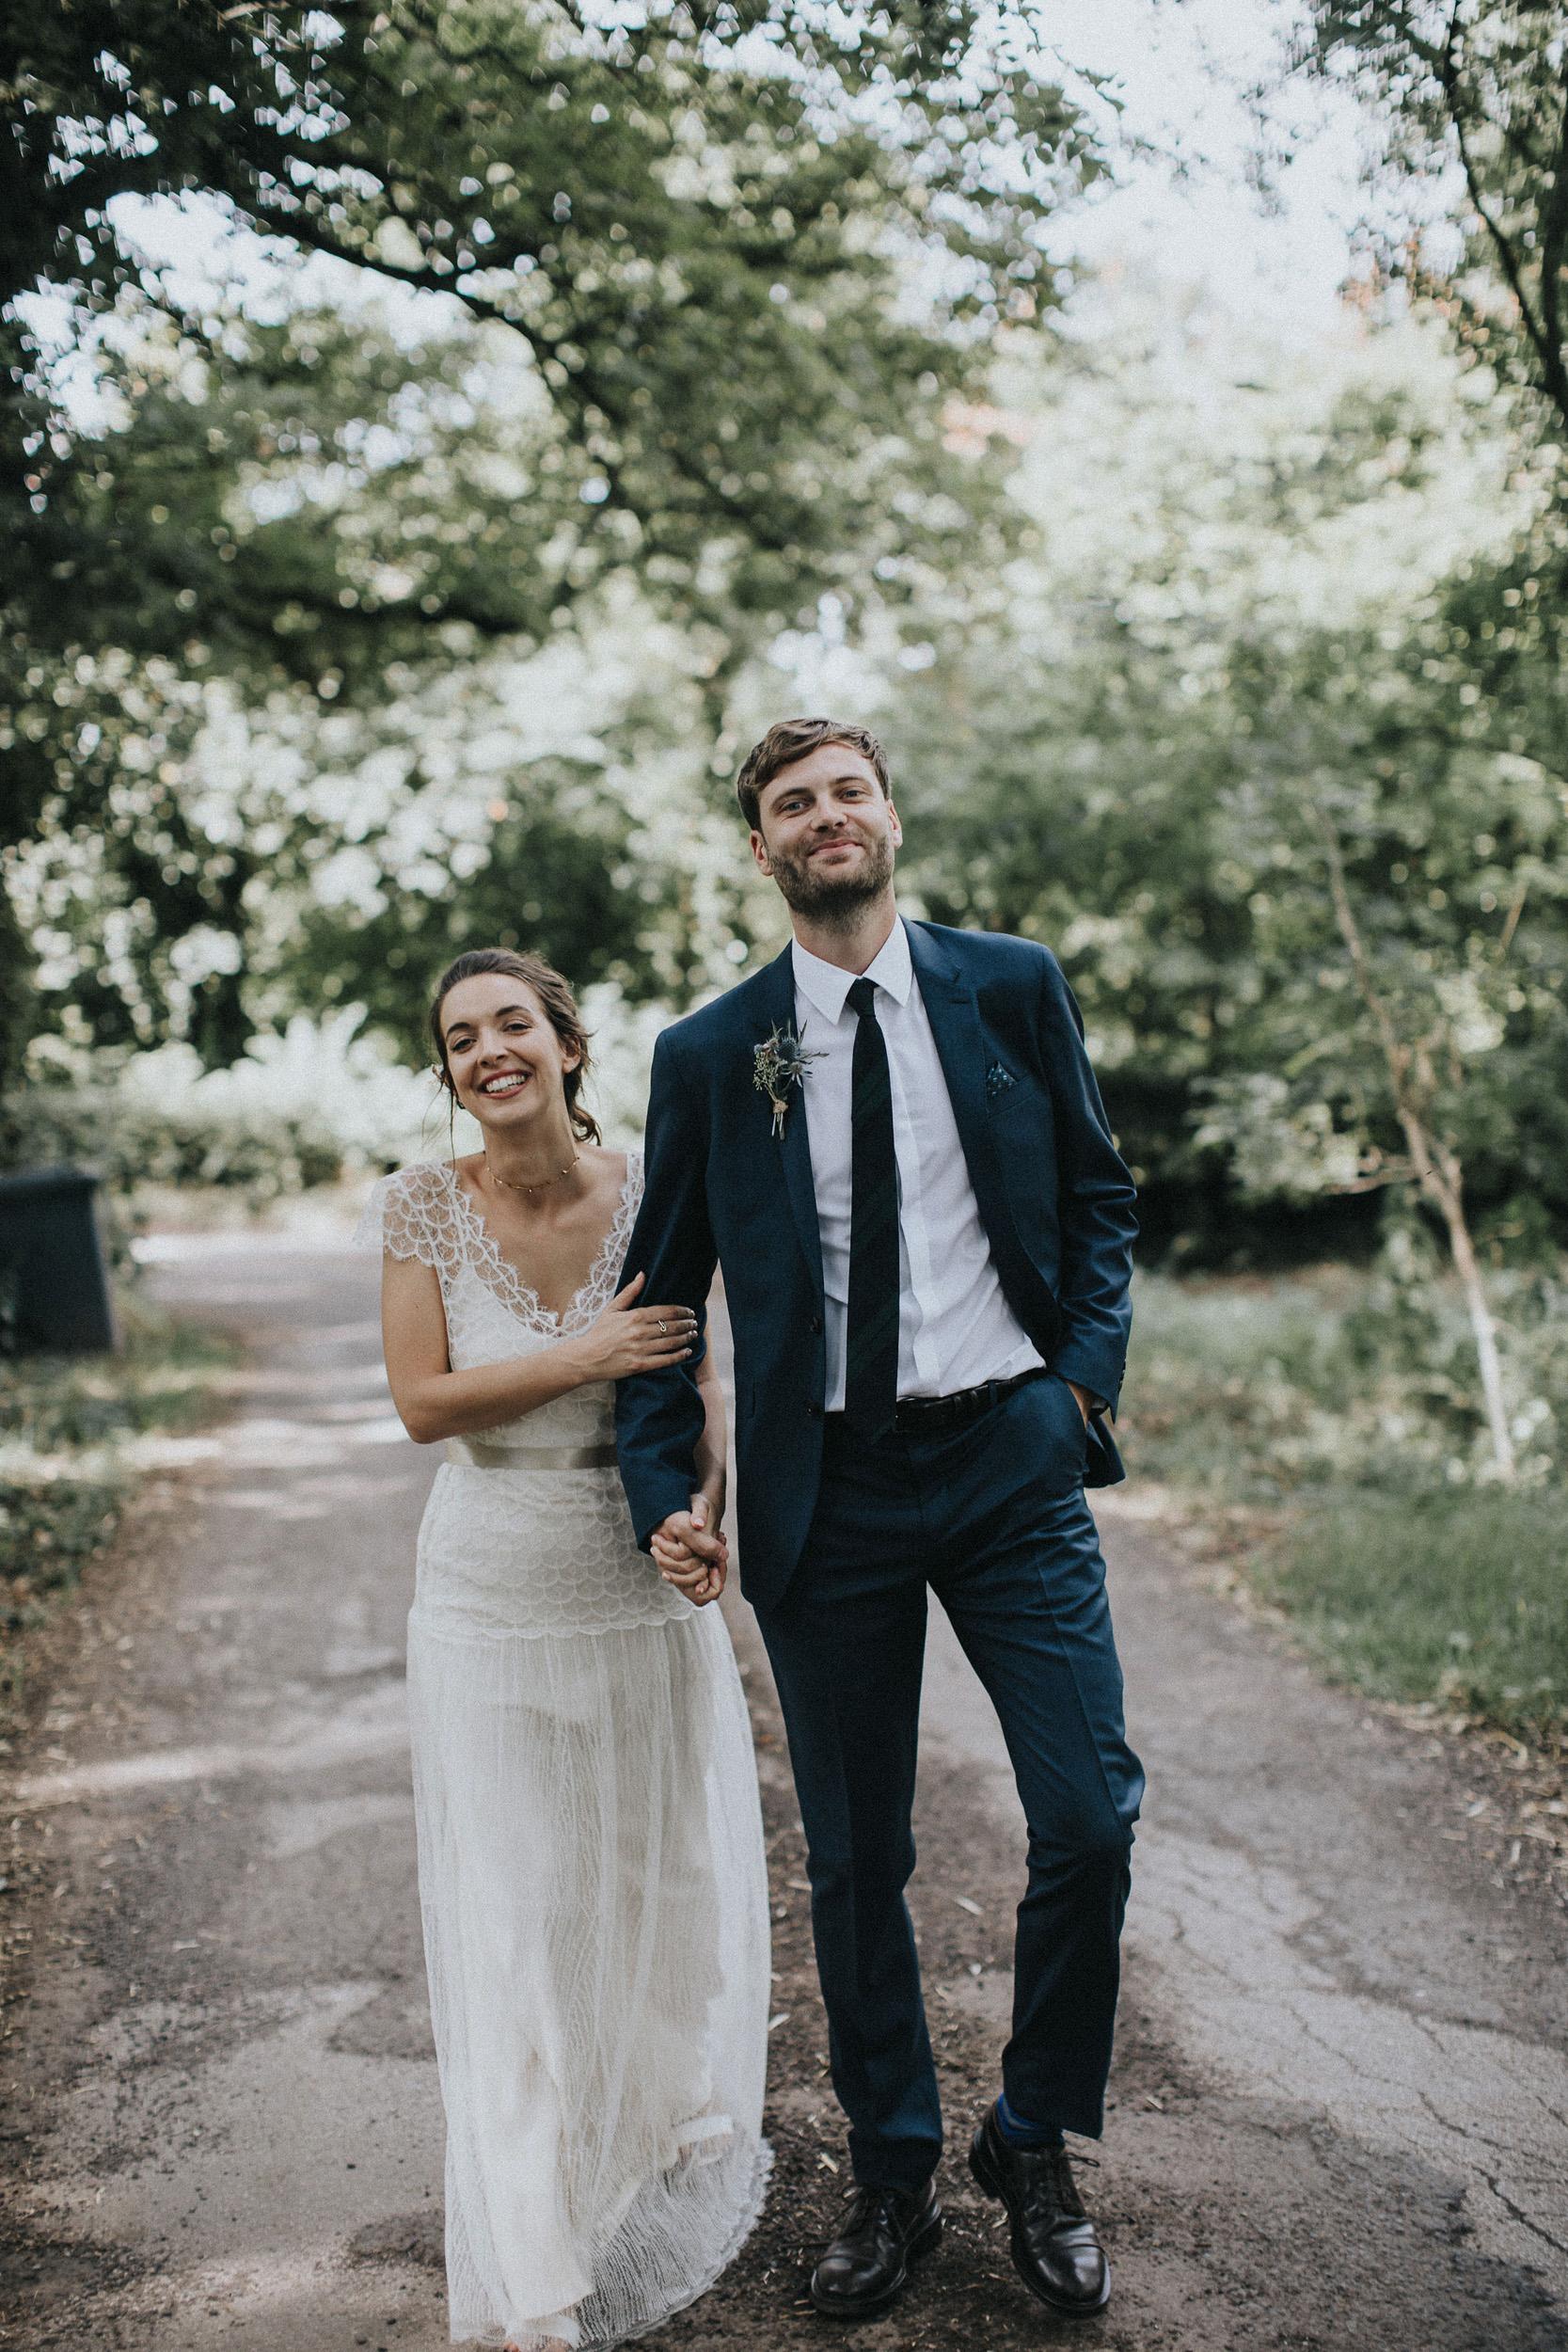 Martha-Laid-Back-Garden-Wedding-Lace-Wedding-Dress-Bohemian-Kate-Beaumont-34.jpg